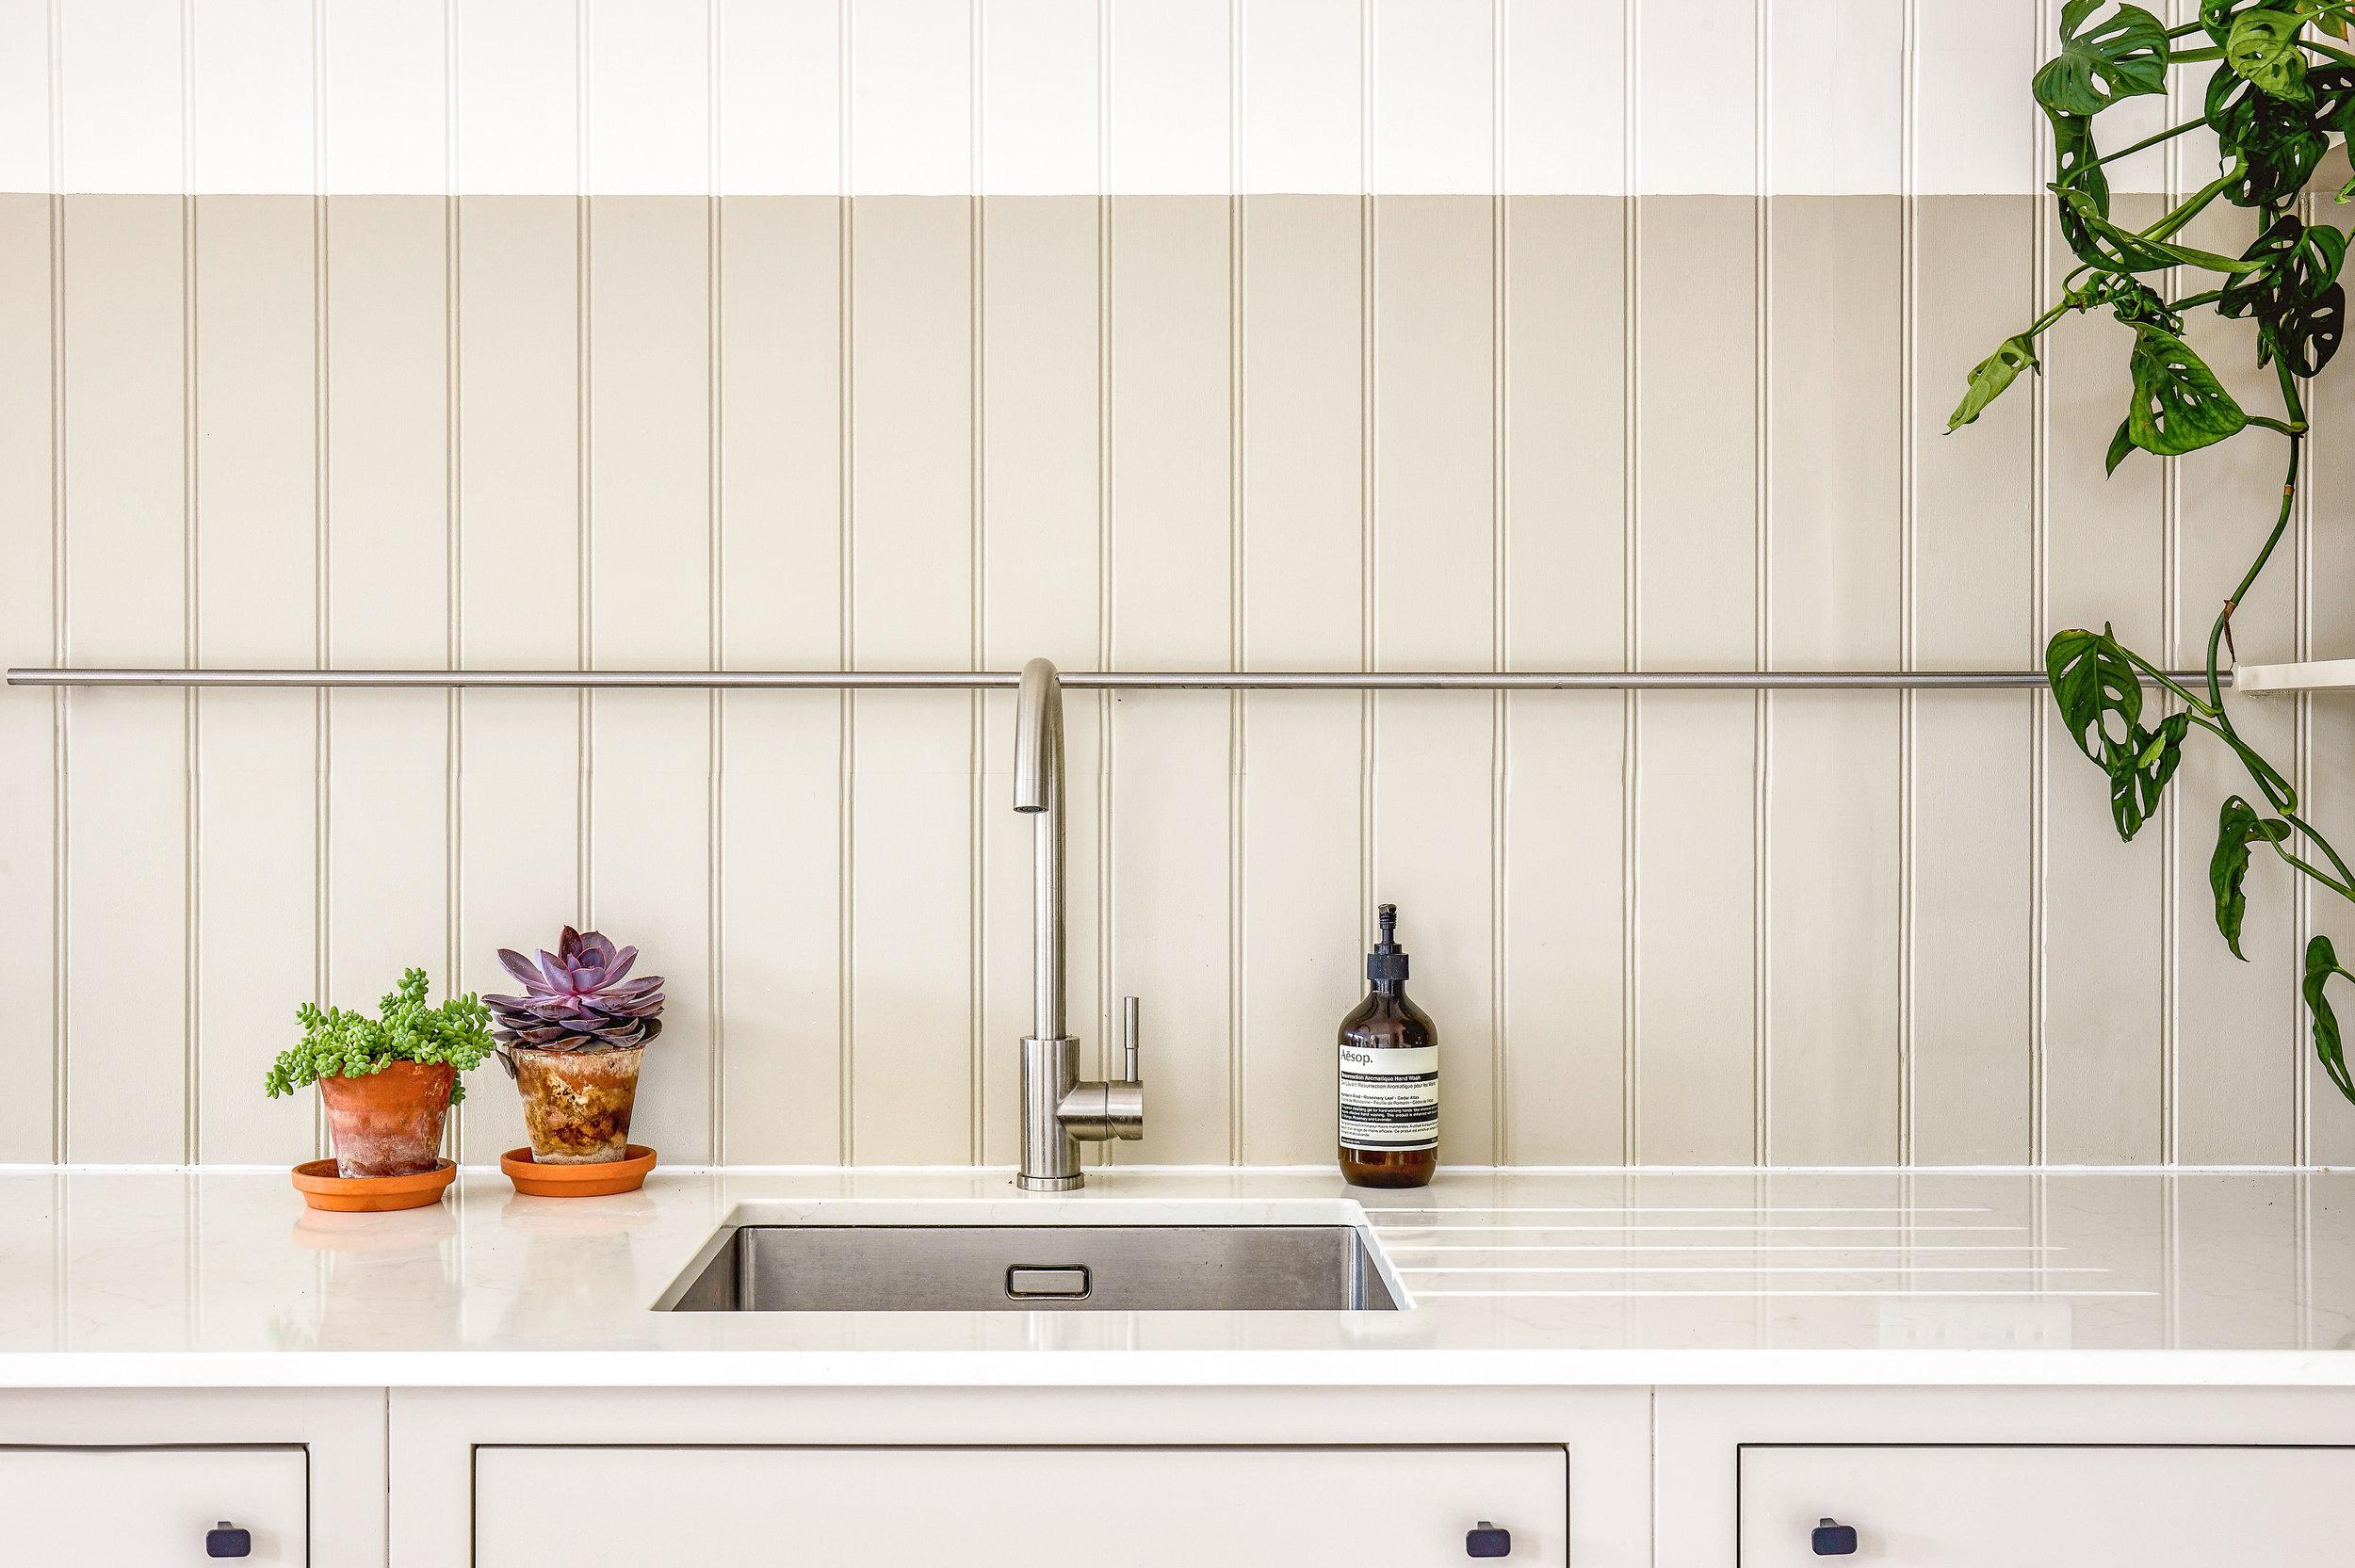 London shaker kitchen